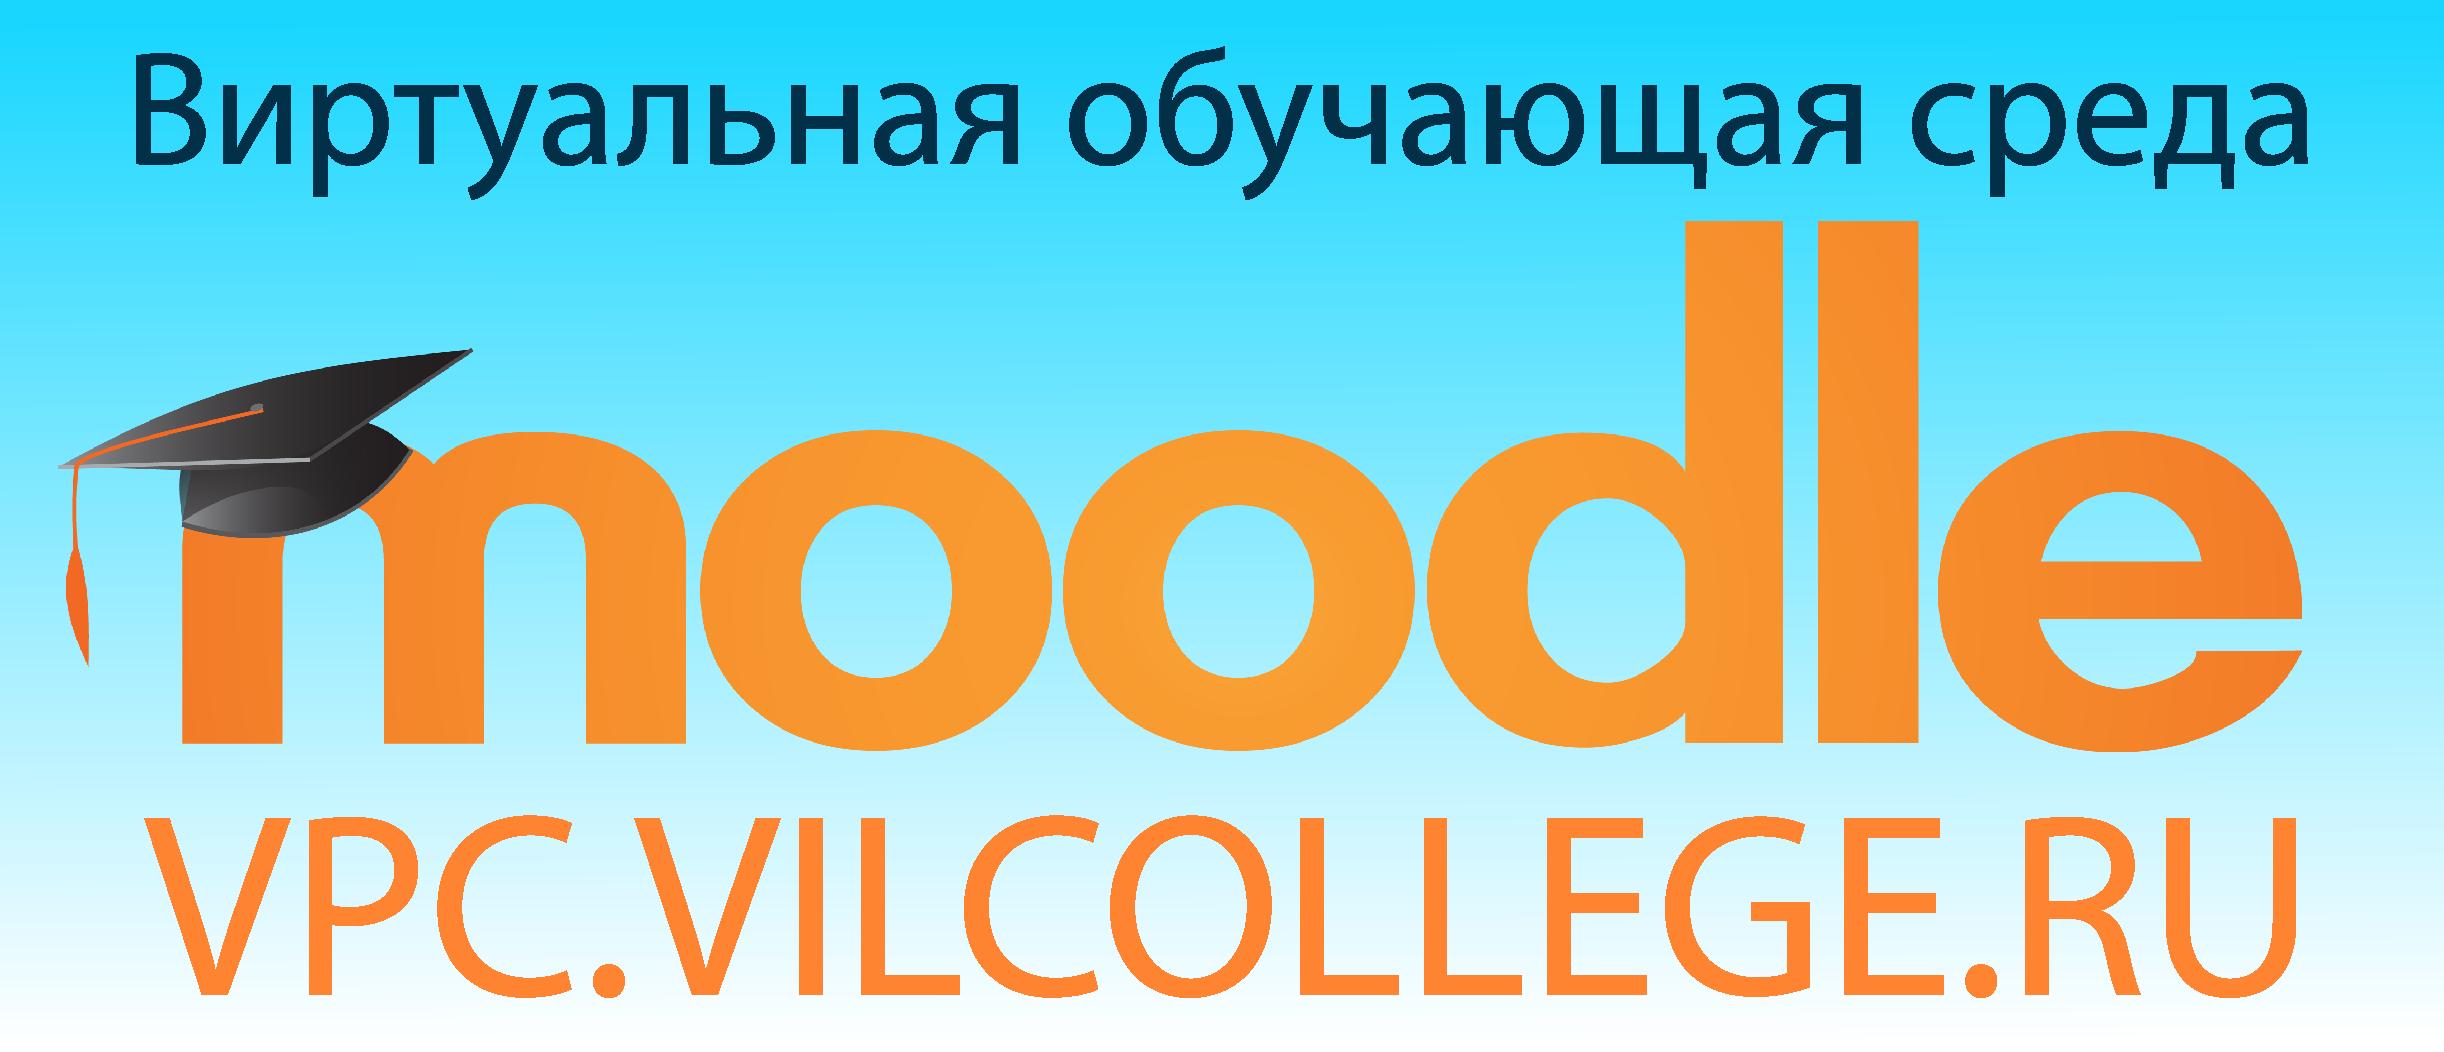 Виртуальная обучающая среда moodle